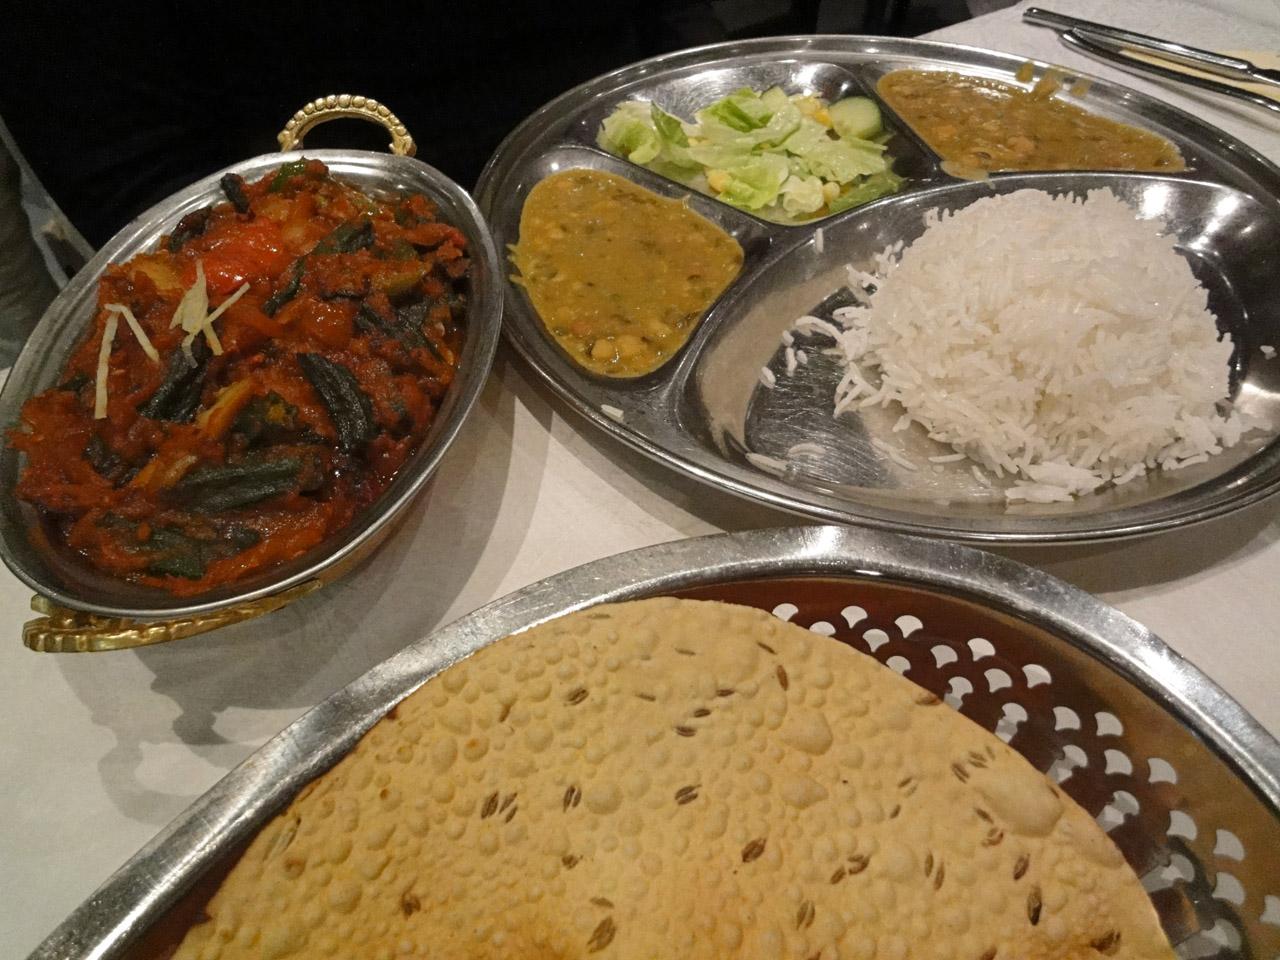 Yeti-Nepal, Helsingfors: Bhindi masala